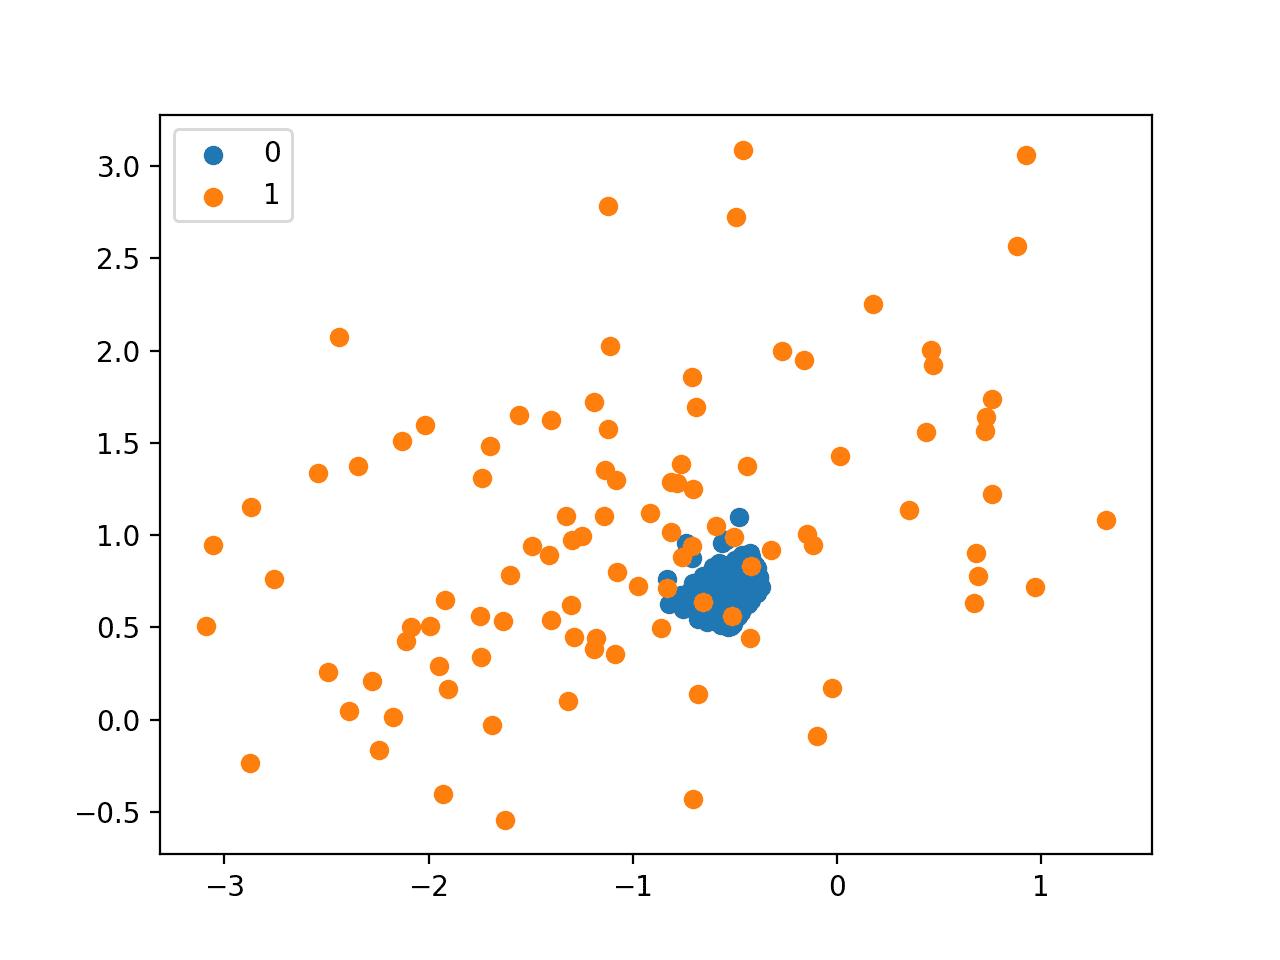 Scatter Plot of Imbalanced Dataset Undersampled With NearMiss-2